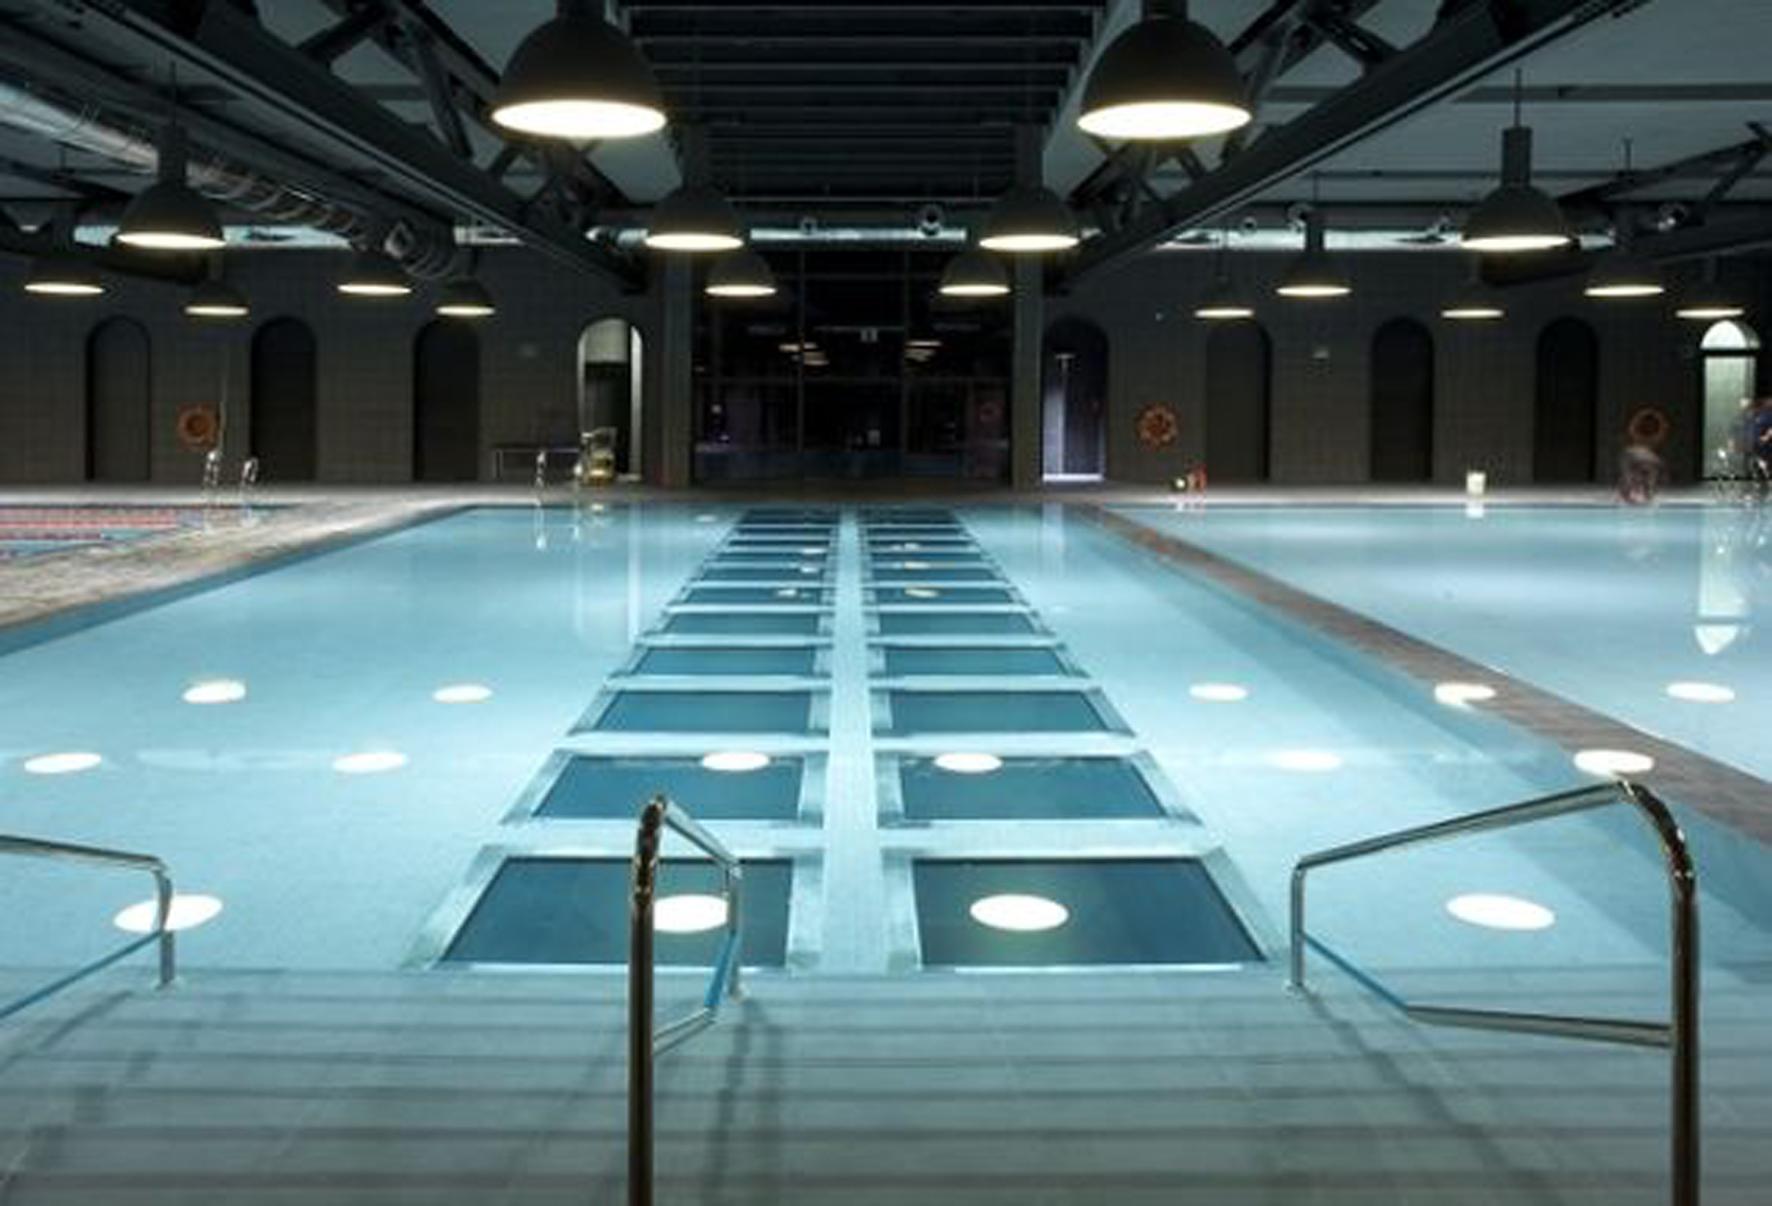 una piscina diferente del arquitecto philippe starck ditail